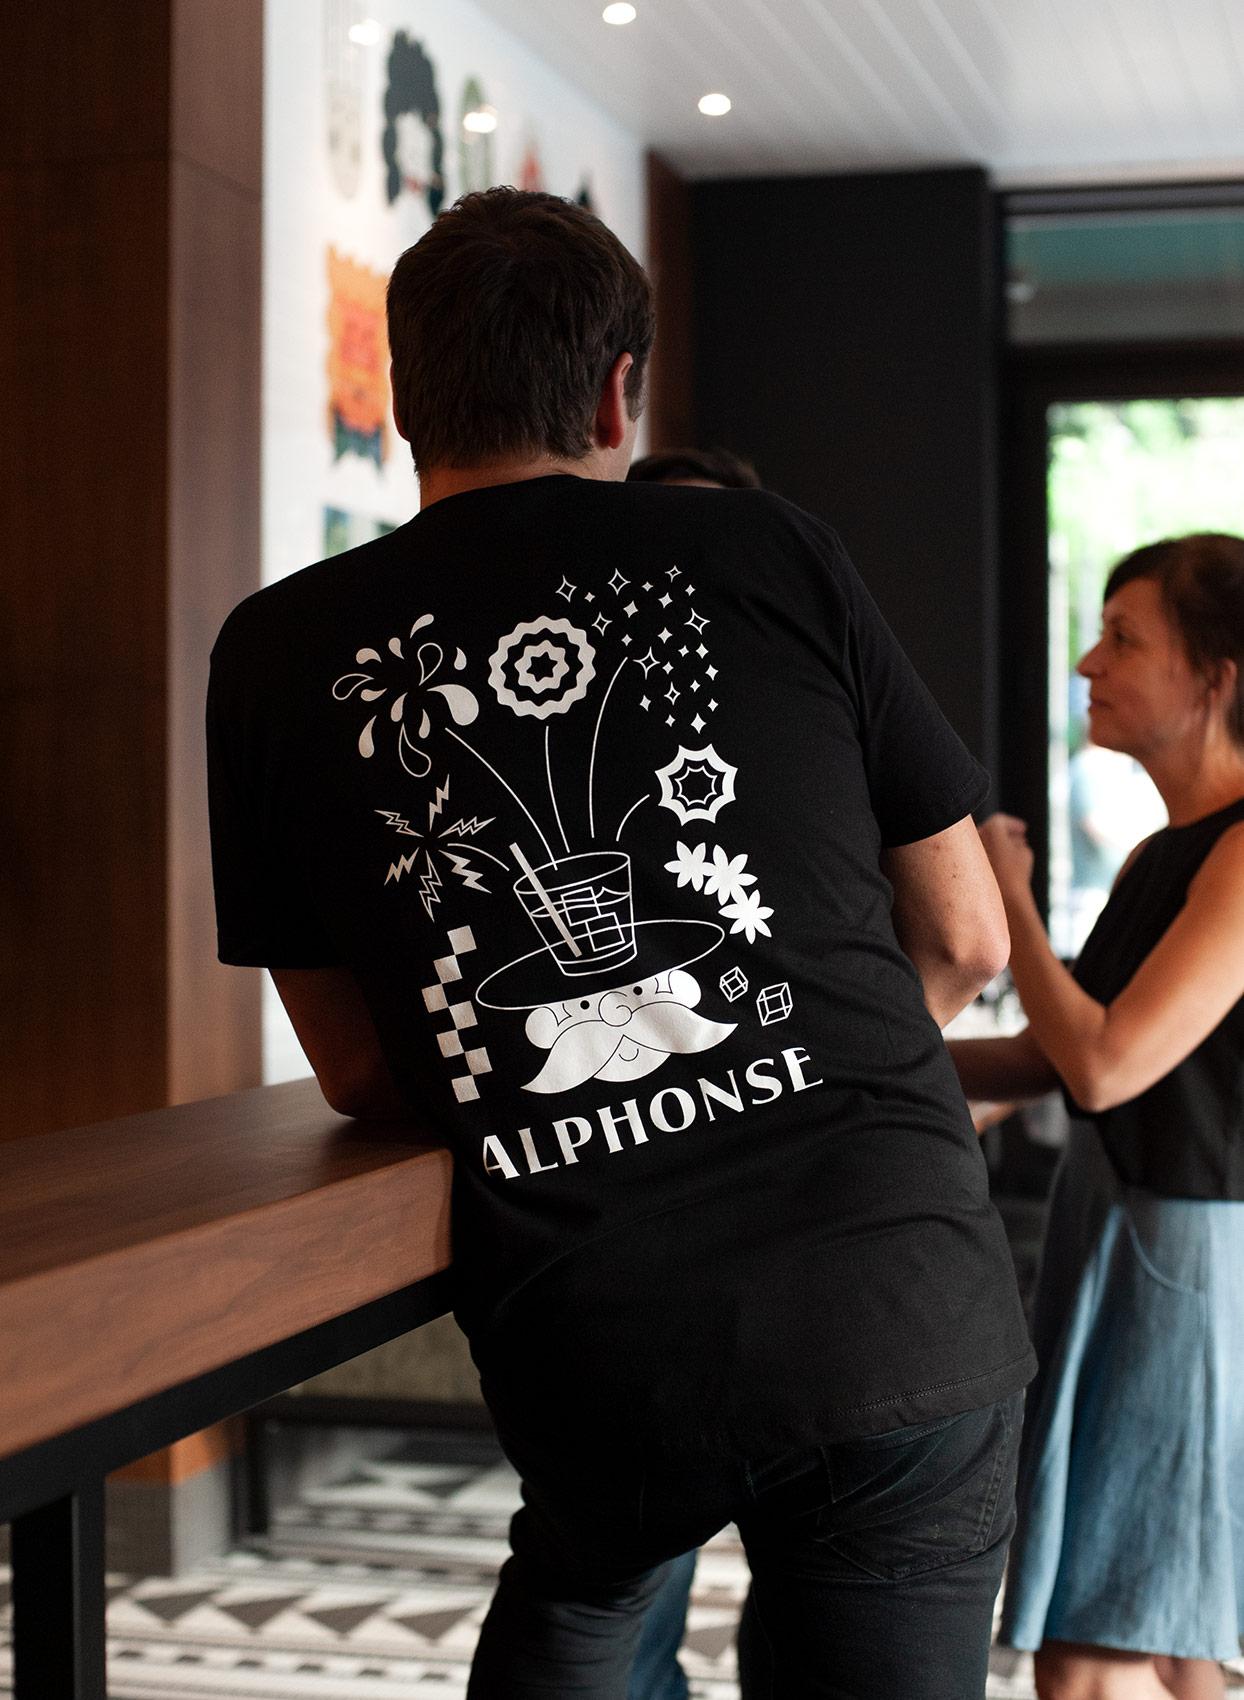 Alphonse-021